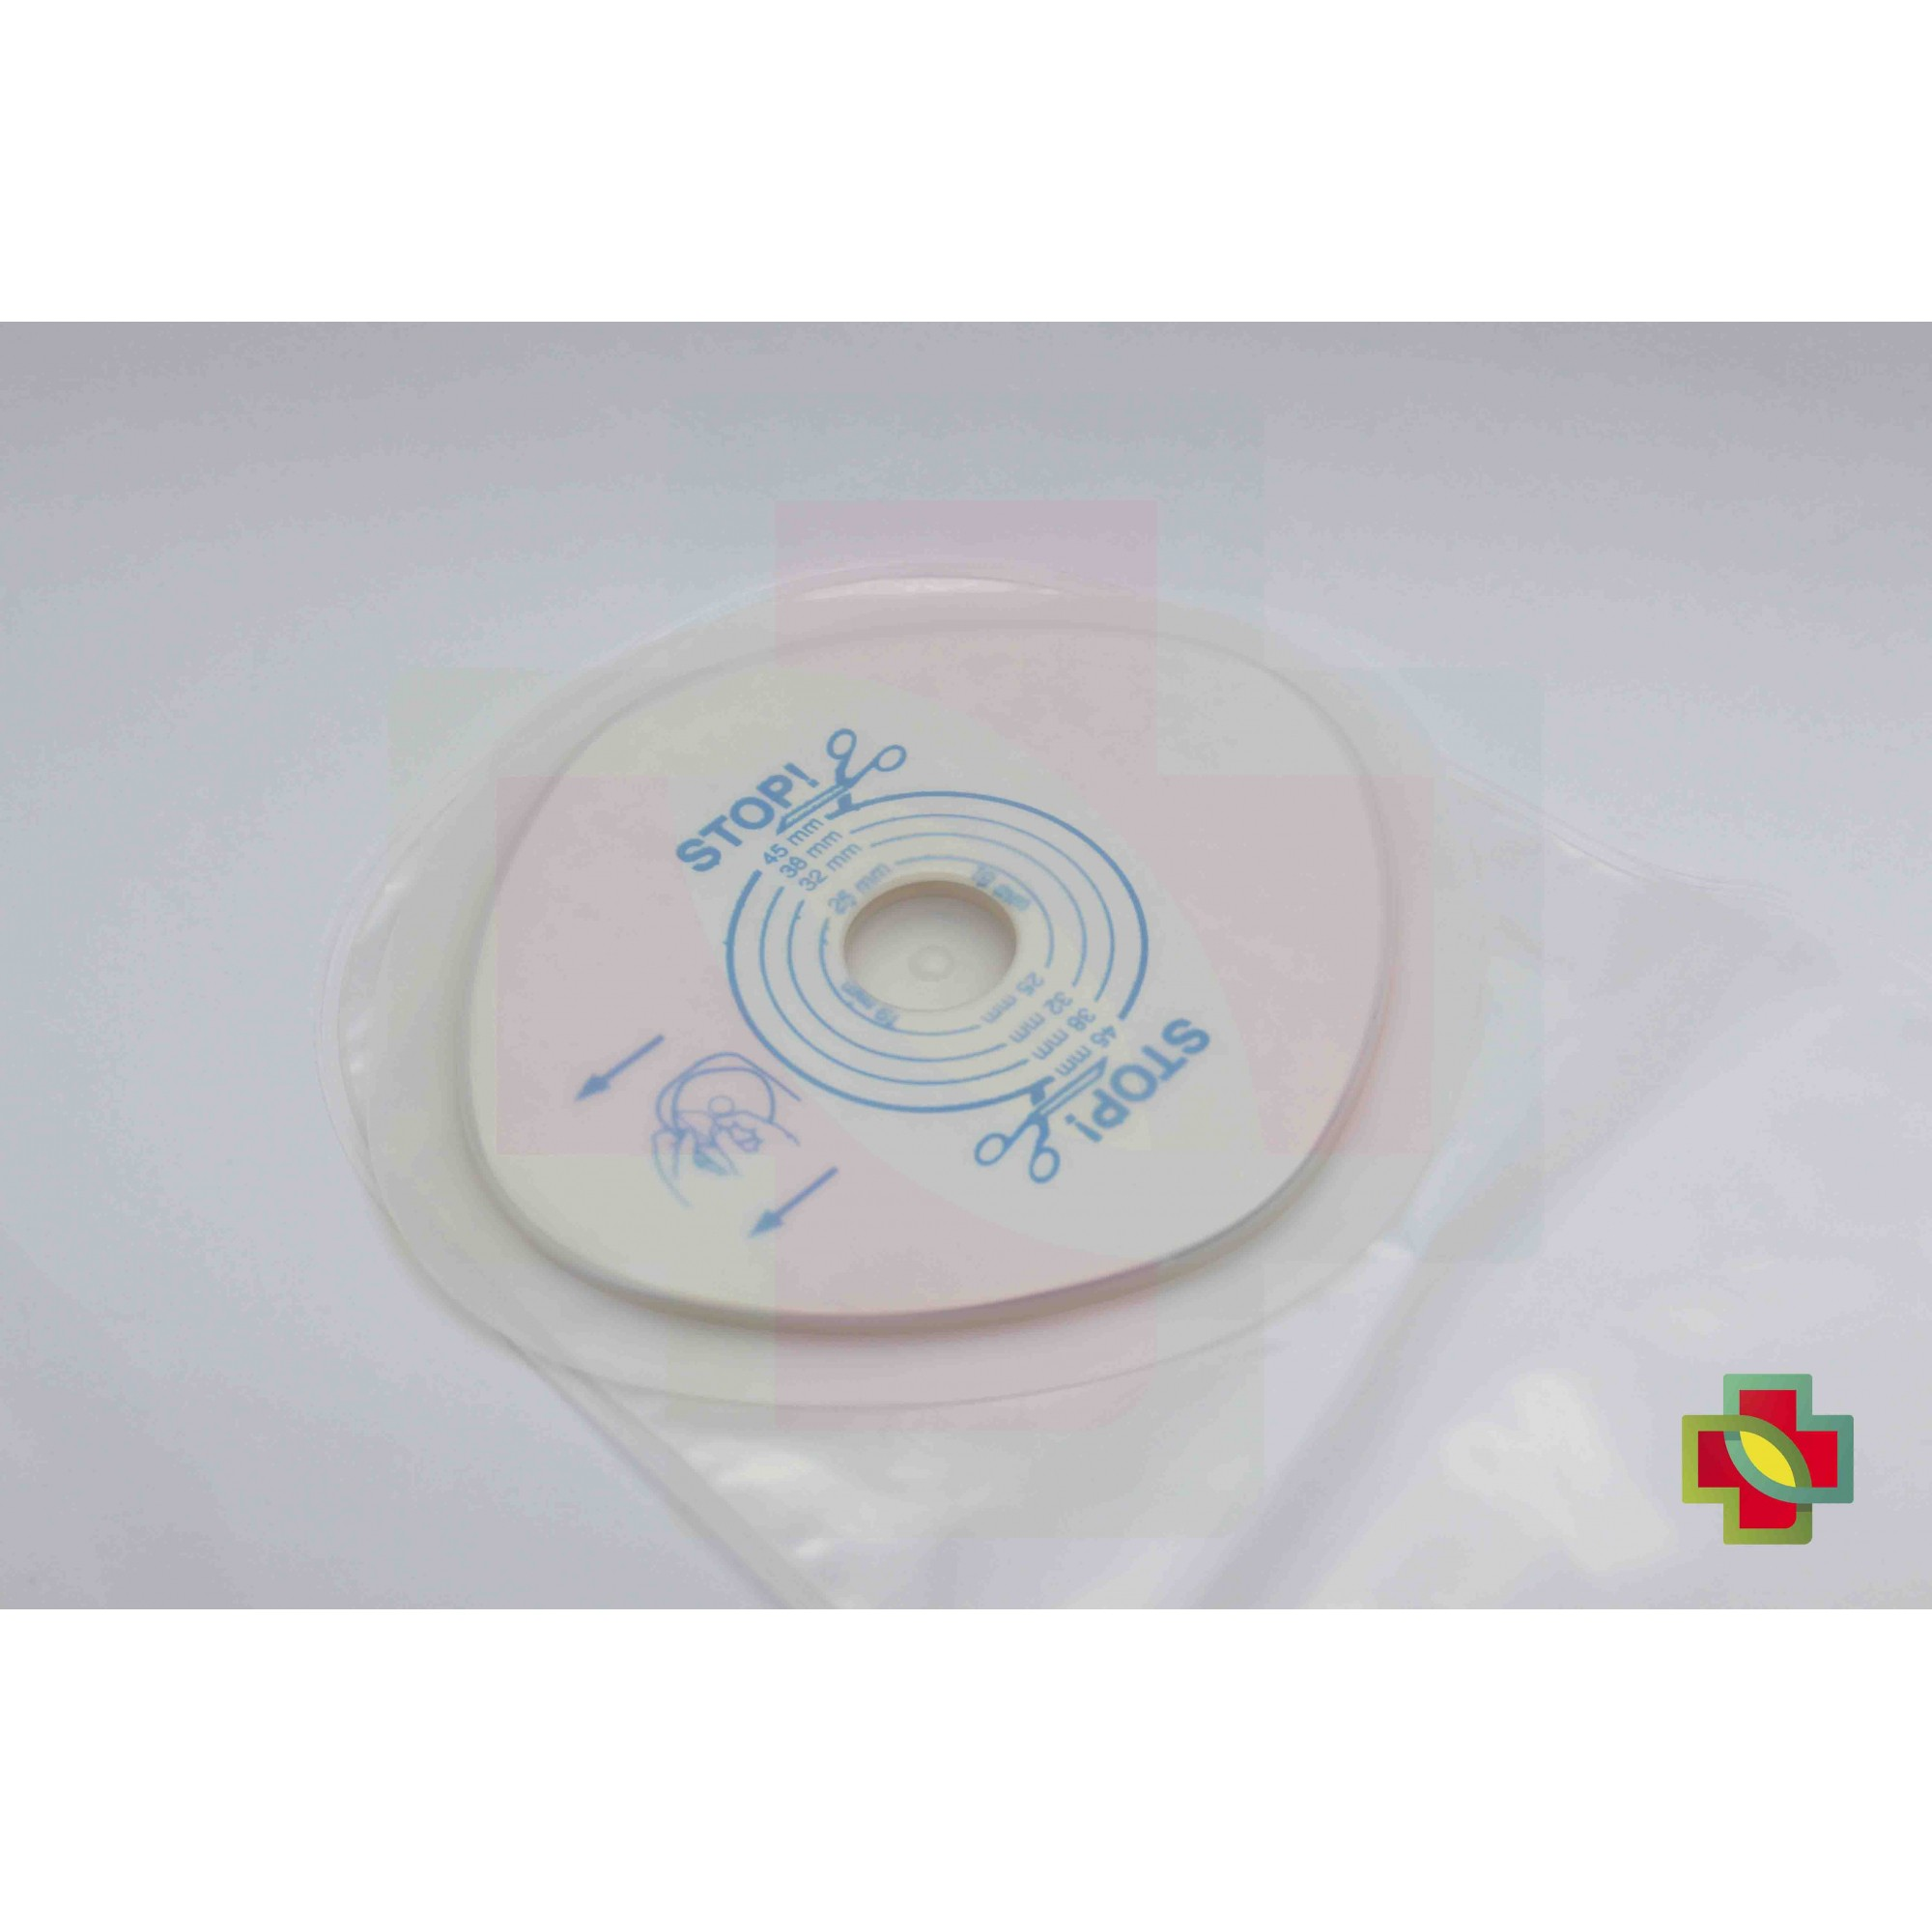 BOLSA DE UROSTOMIA ACTIVE-LIFE ANTI-REFLUXO 19-45 MM (C/10) 64927 - CONVATEC